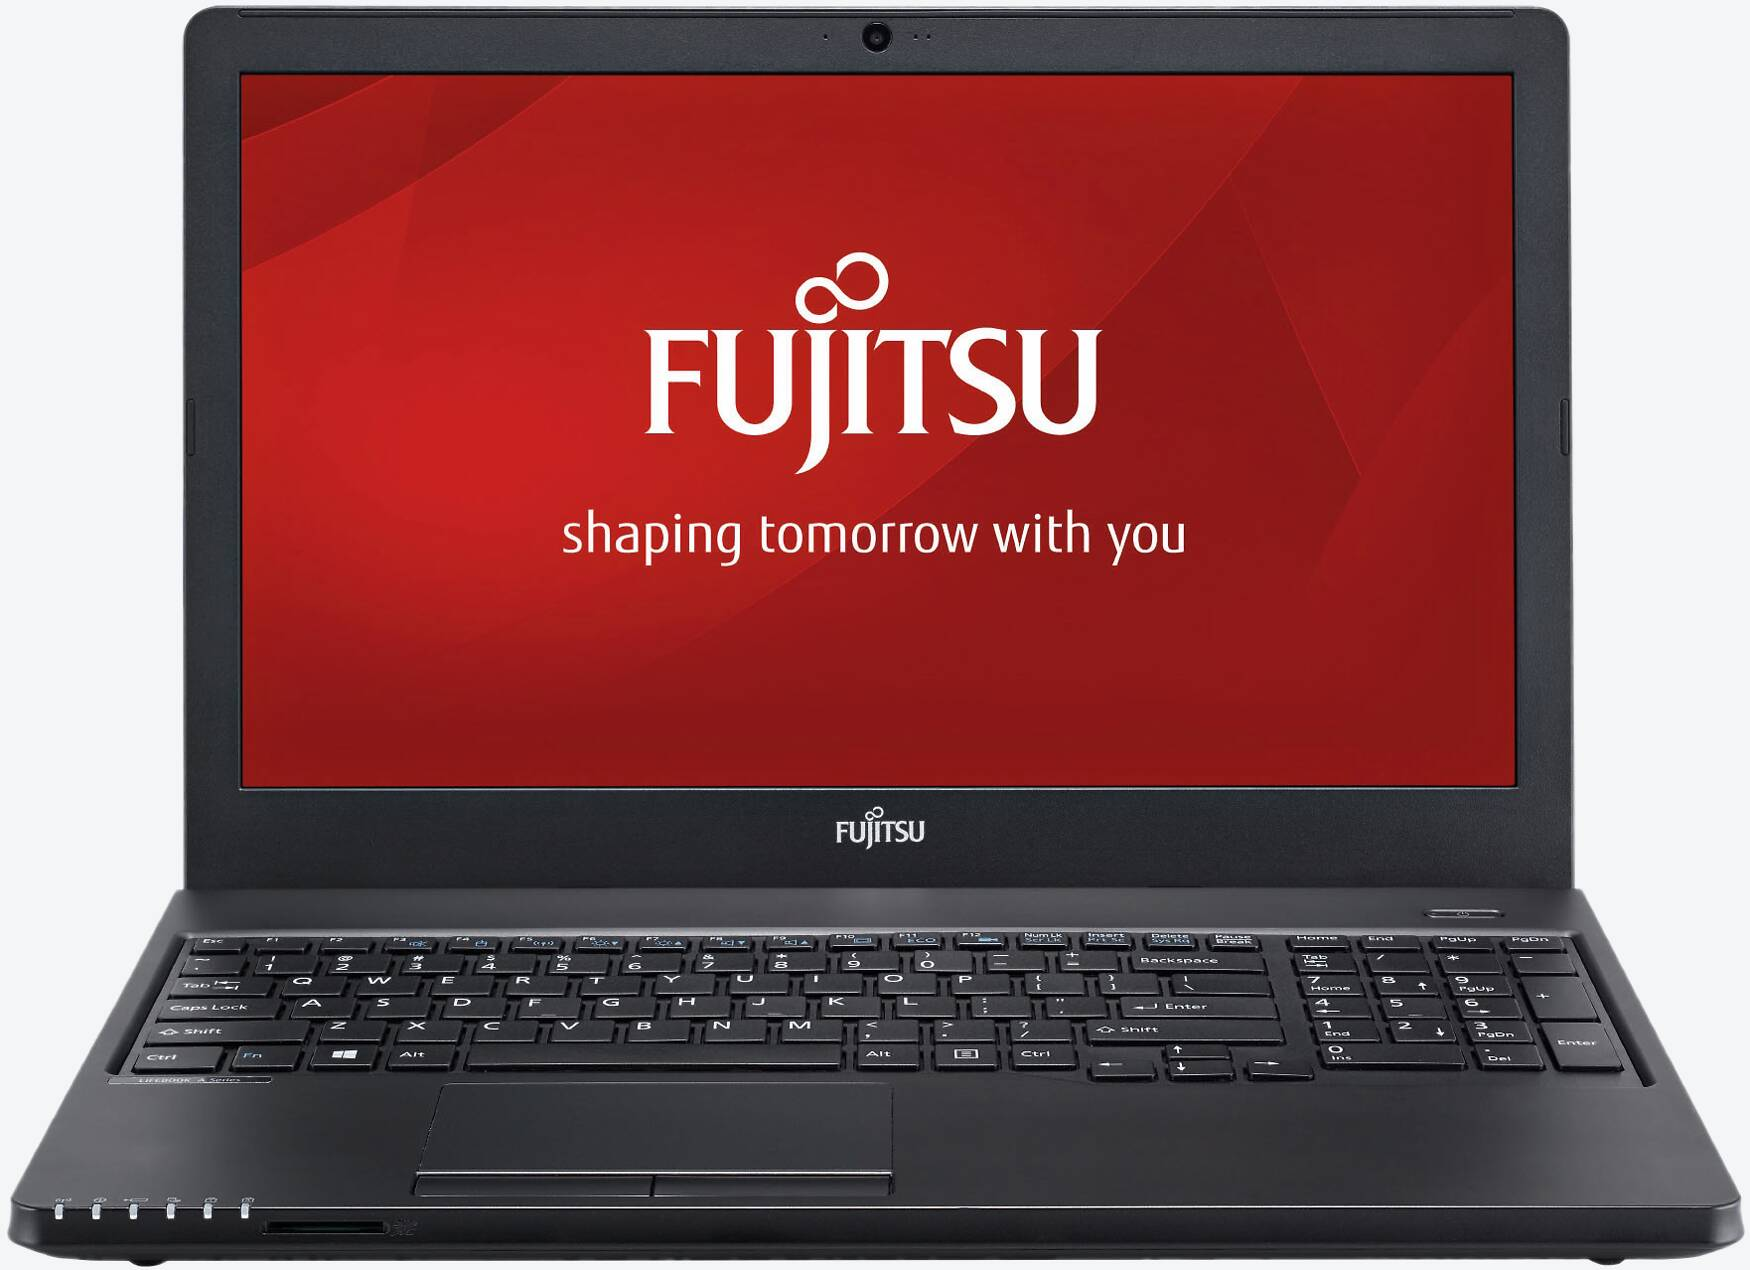 Fujitsu LIFEBOOK A357 Intel Core i5 2.5 GHz 8GB RAM 256GB Win10 Pro